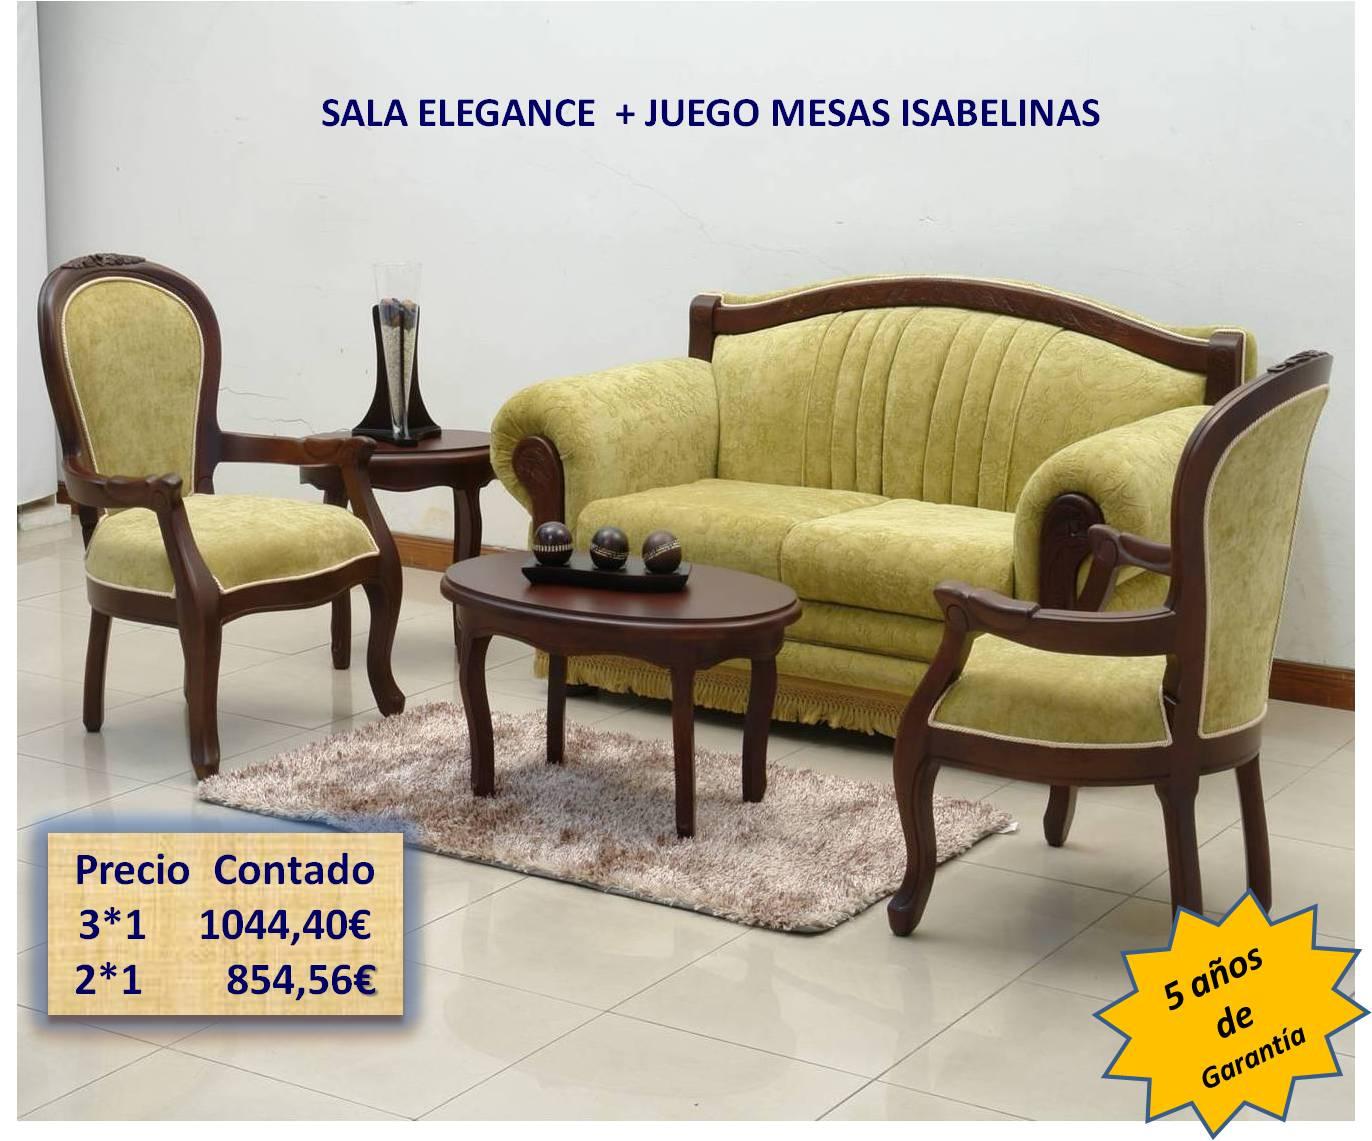 Muebles para colombia ibg madrid for Colores de muebles